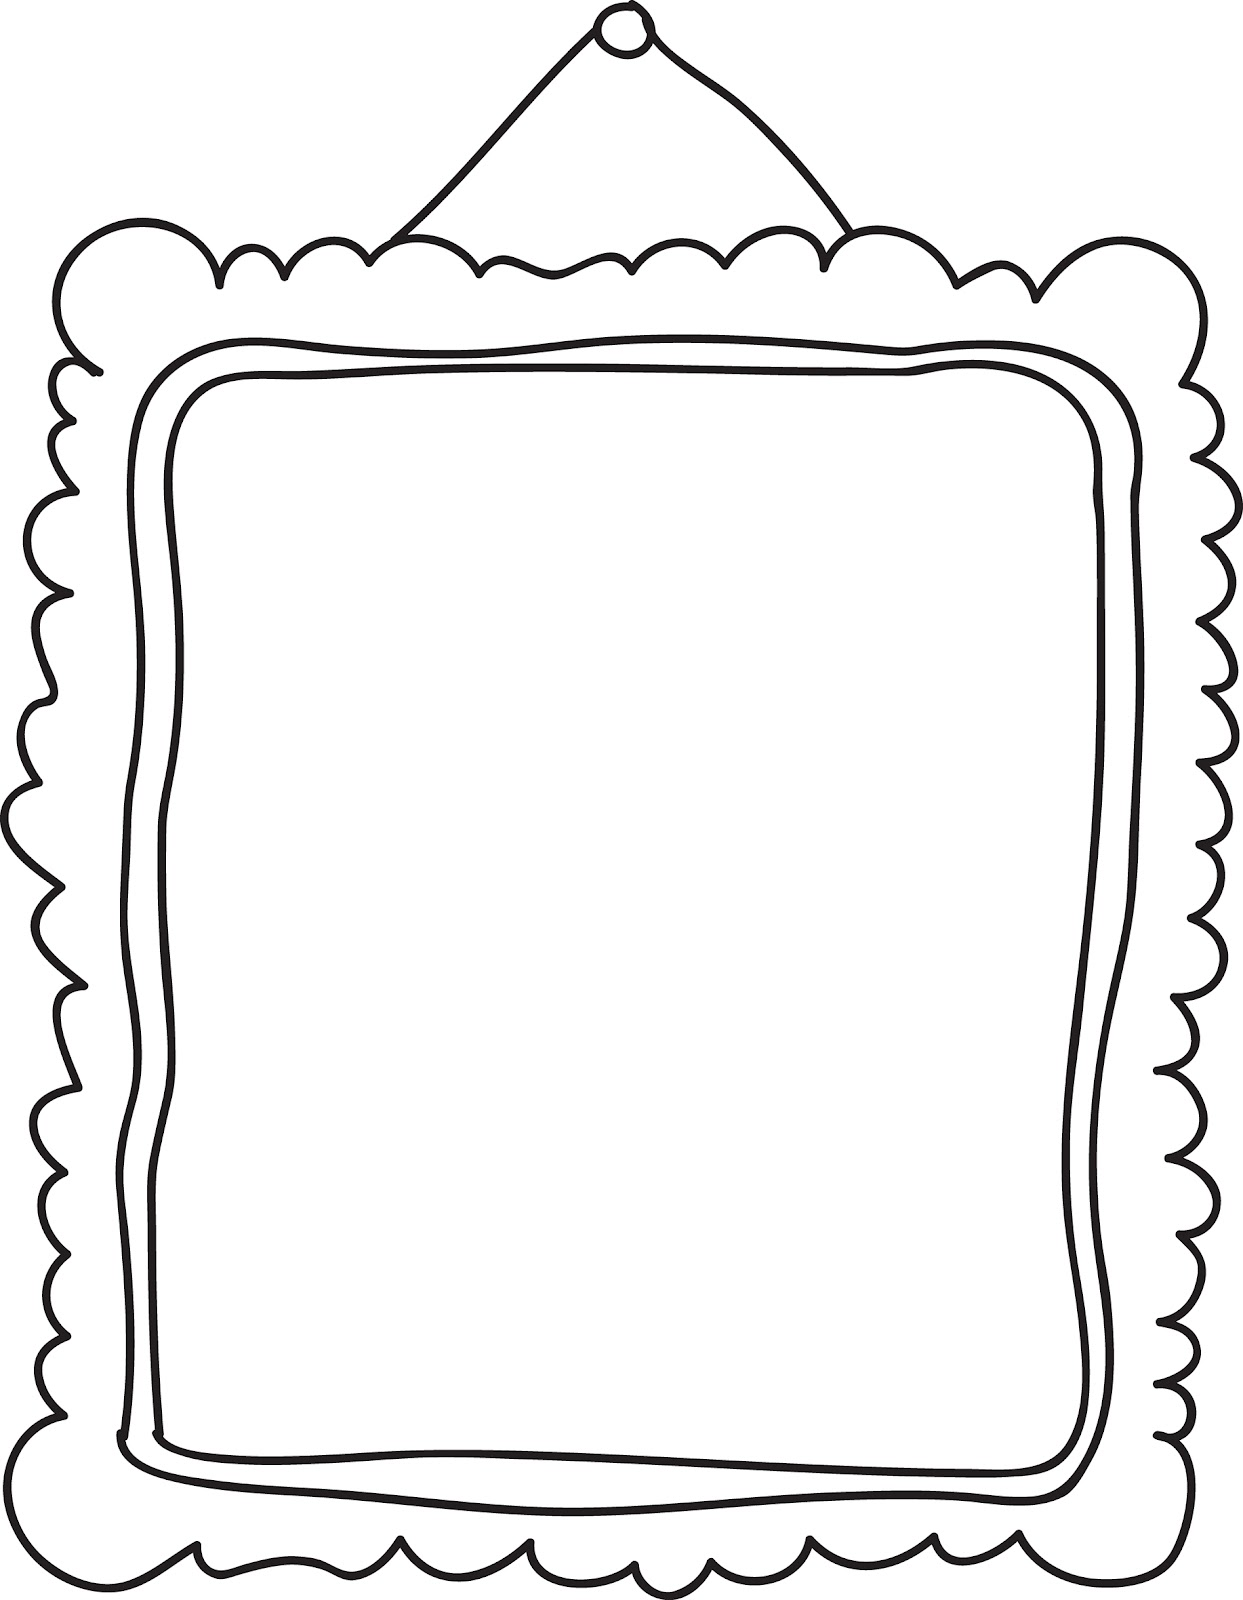 Full Page Double Bracket Frame Free Clip Art Frames Image